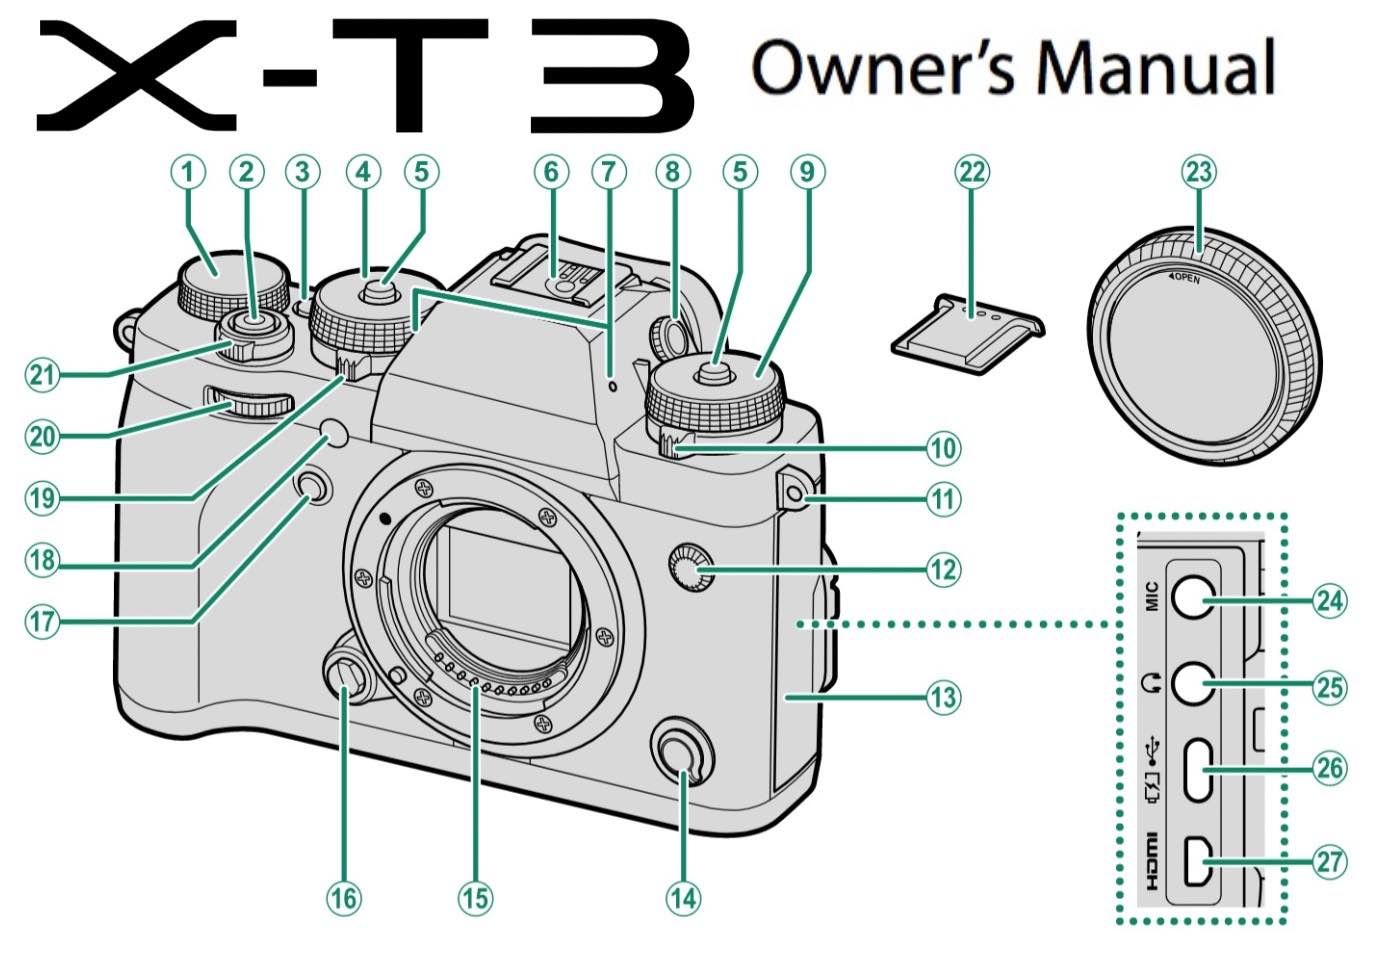 Fujifilm X-T3 Owners Manual Available - Fuji Rumors